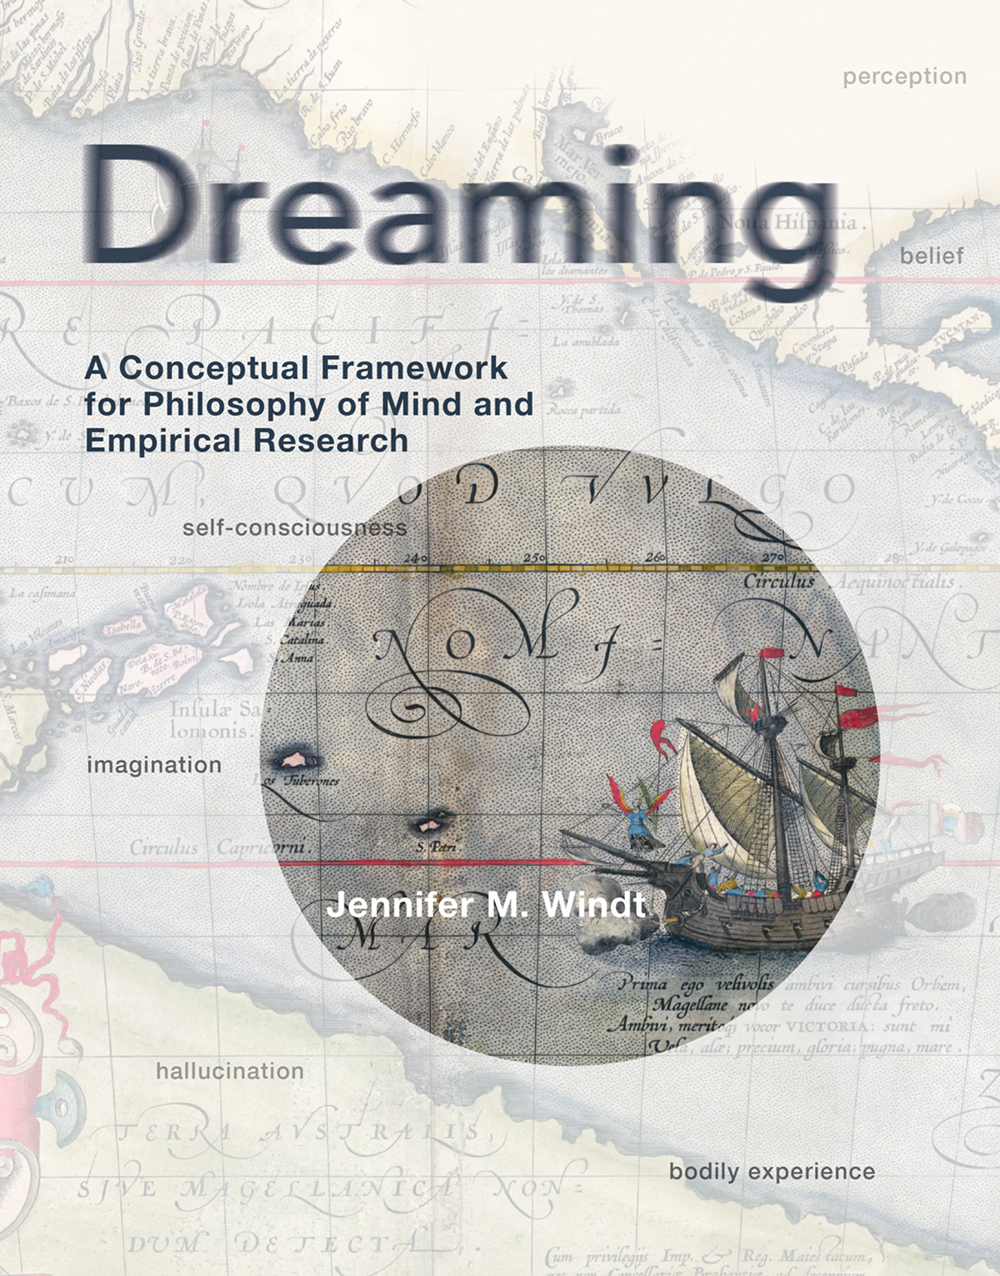 jennifer windt dissertation